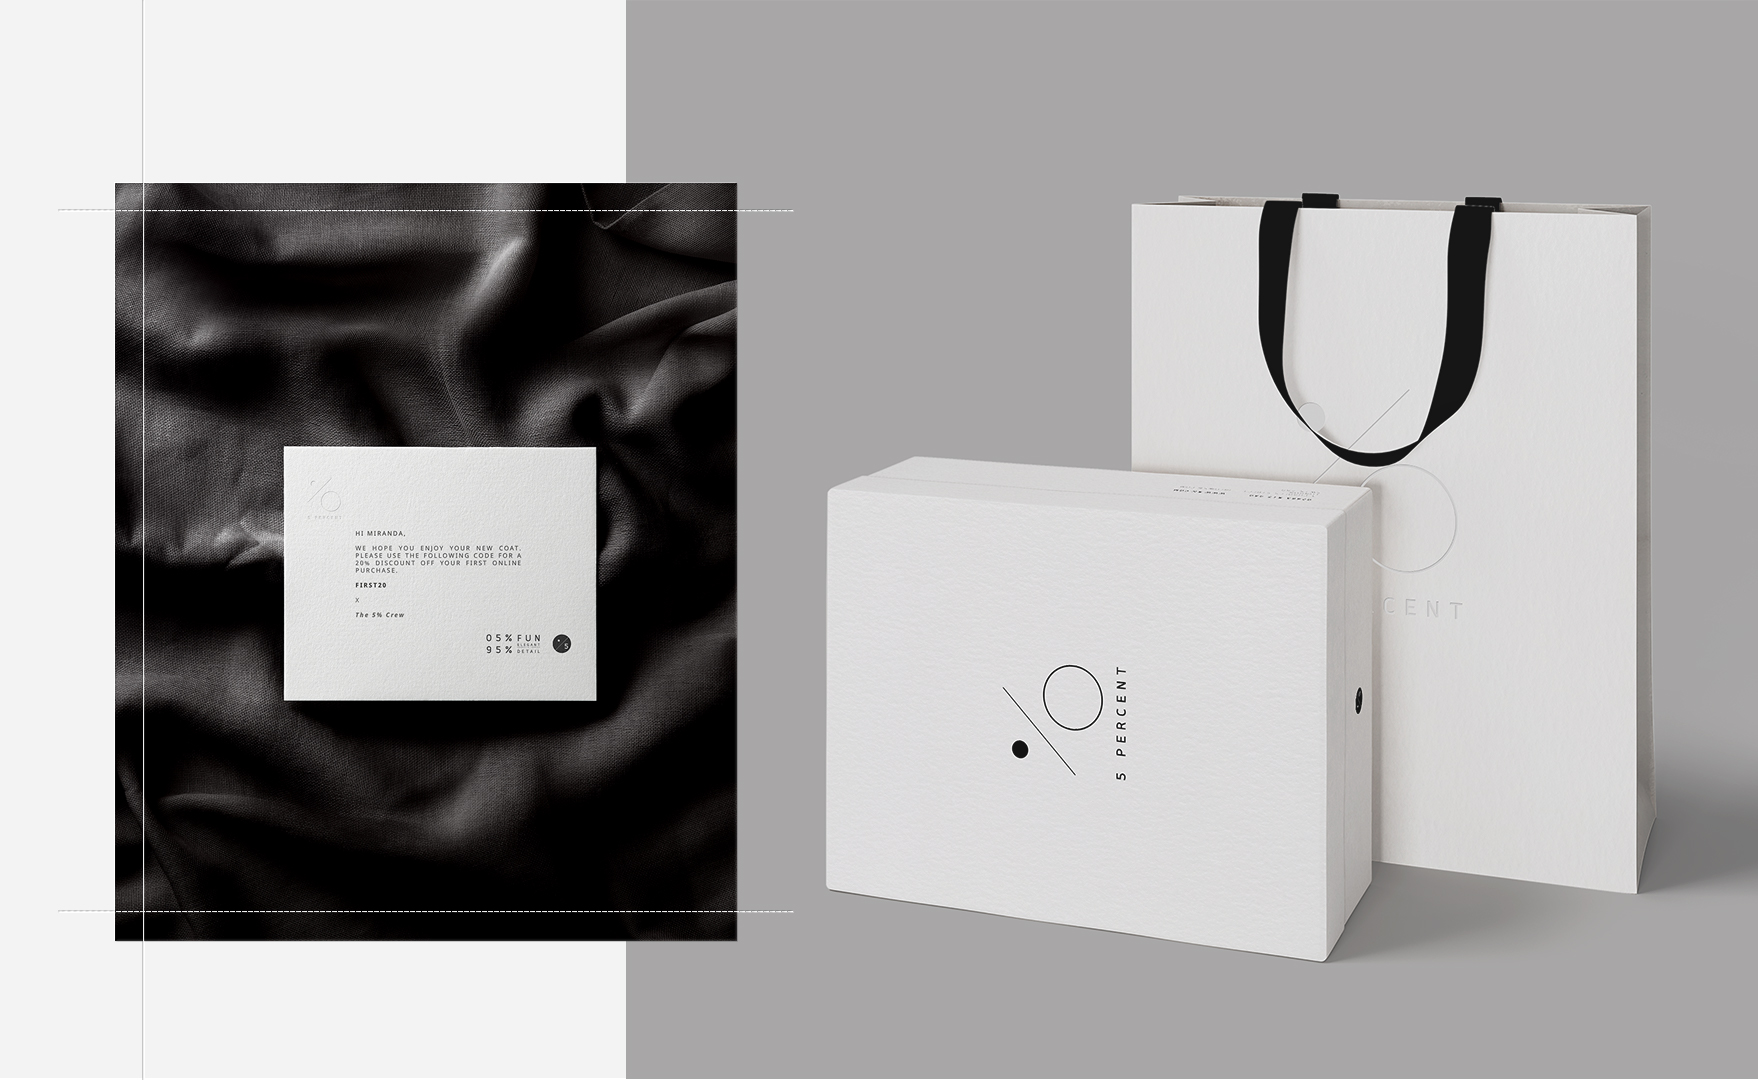 luxury retailer bag design print